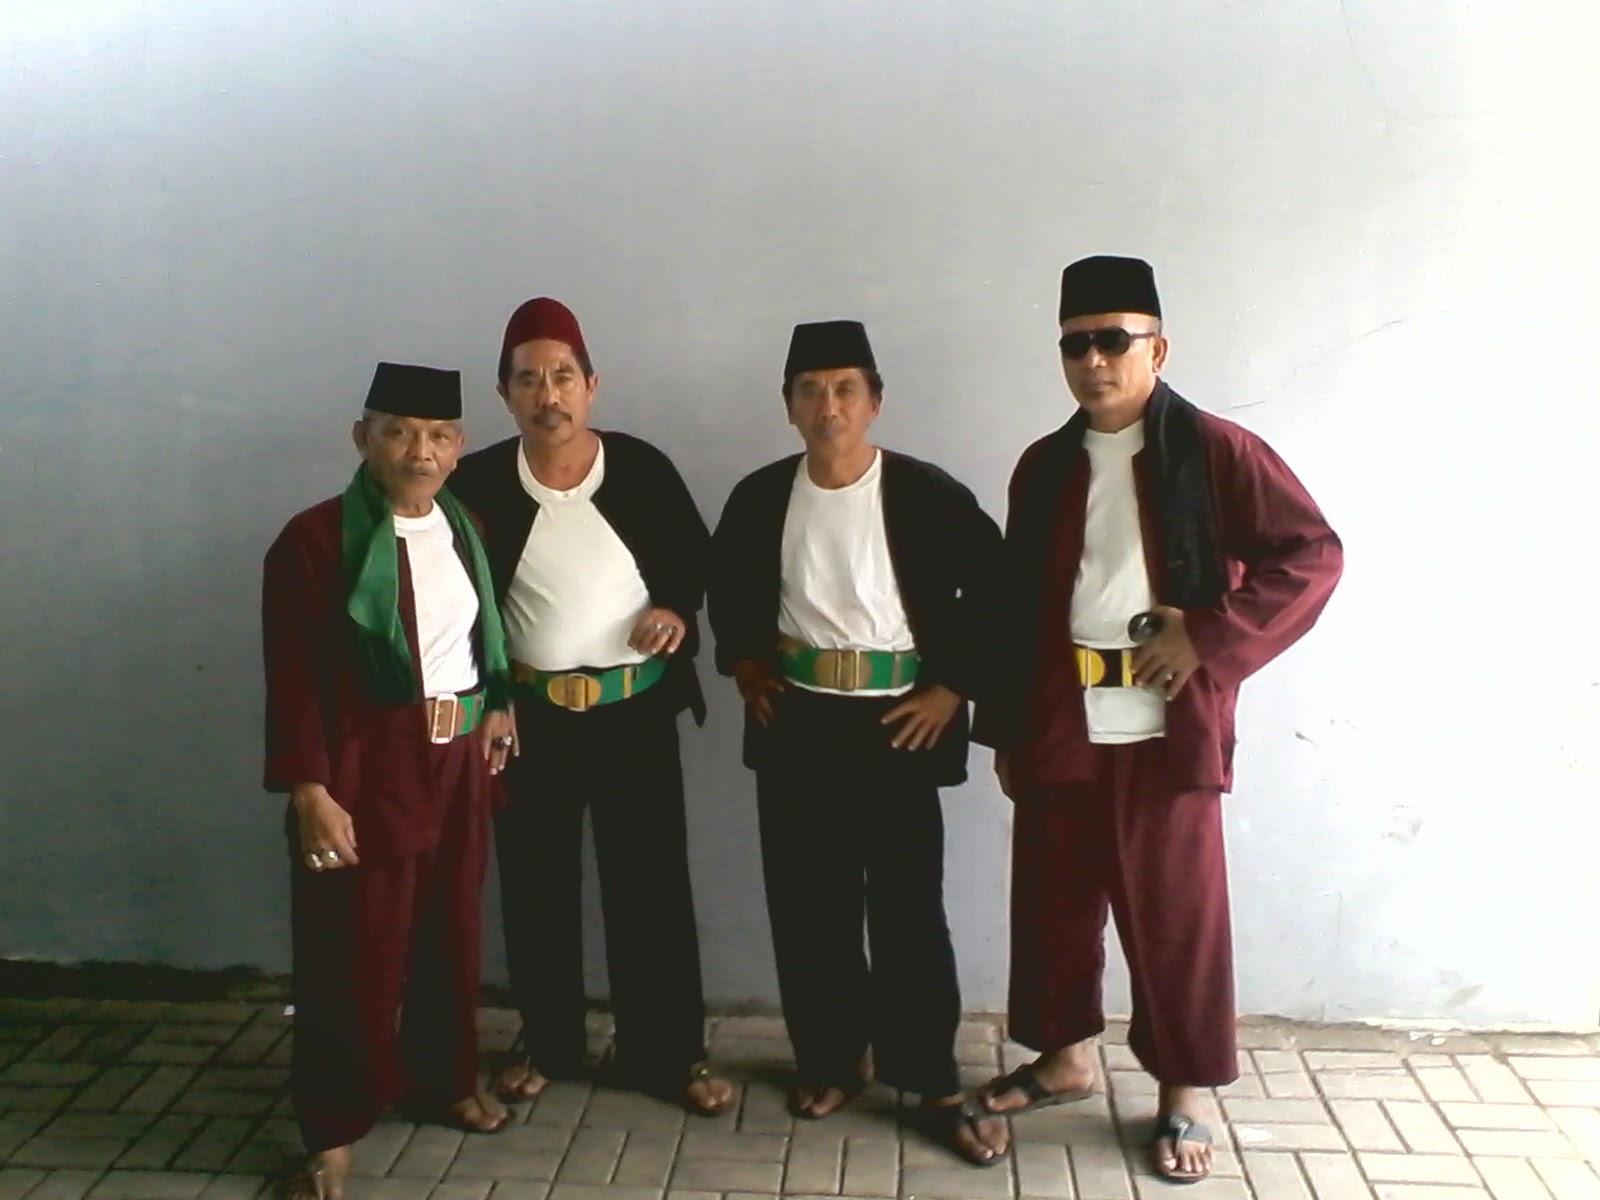 http://pesanbajupangsionline.blogspot.com/